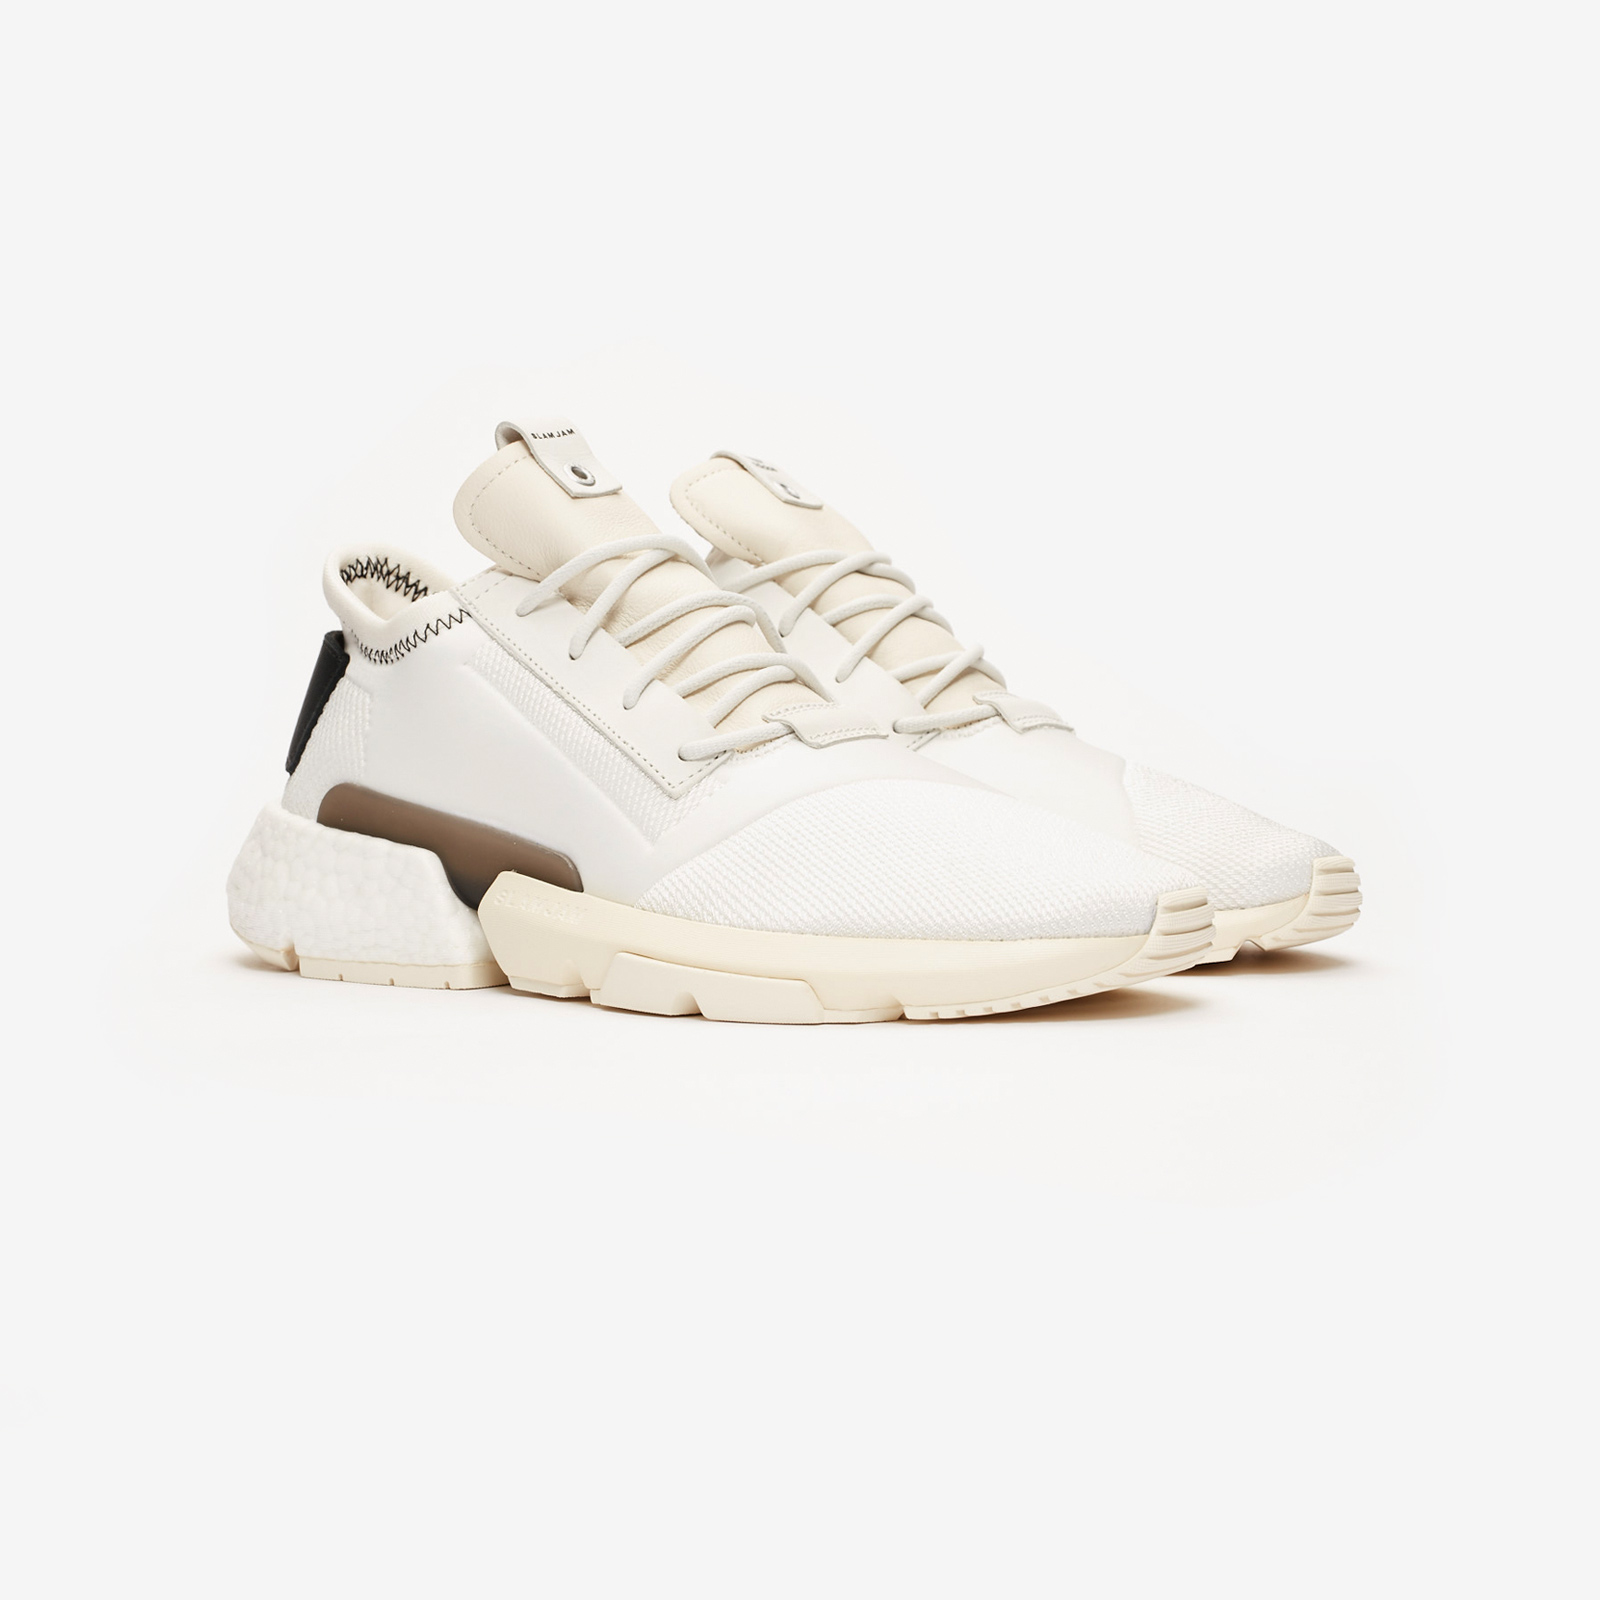 a3907cd1c45e4 adidas POD S3.1 x Slam Jam - Bb9484 - Sneakersnstuff